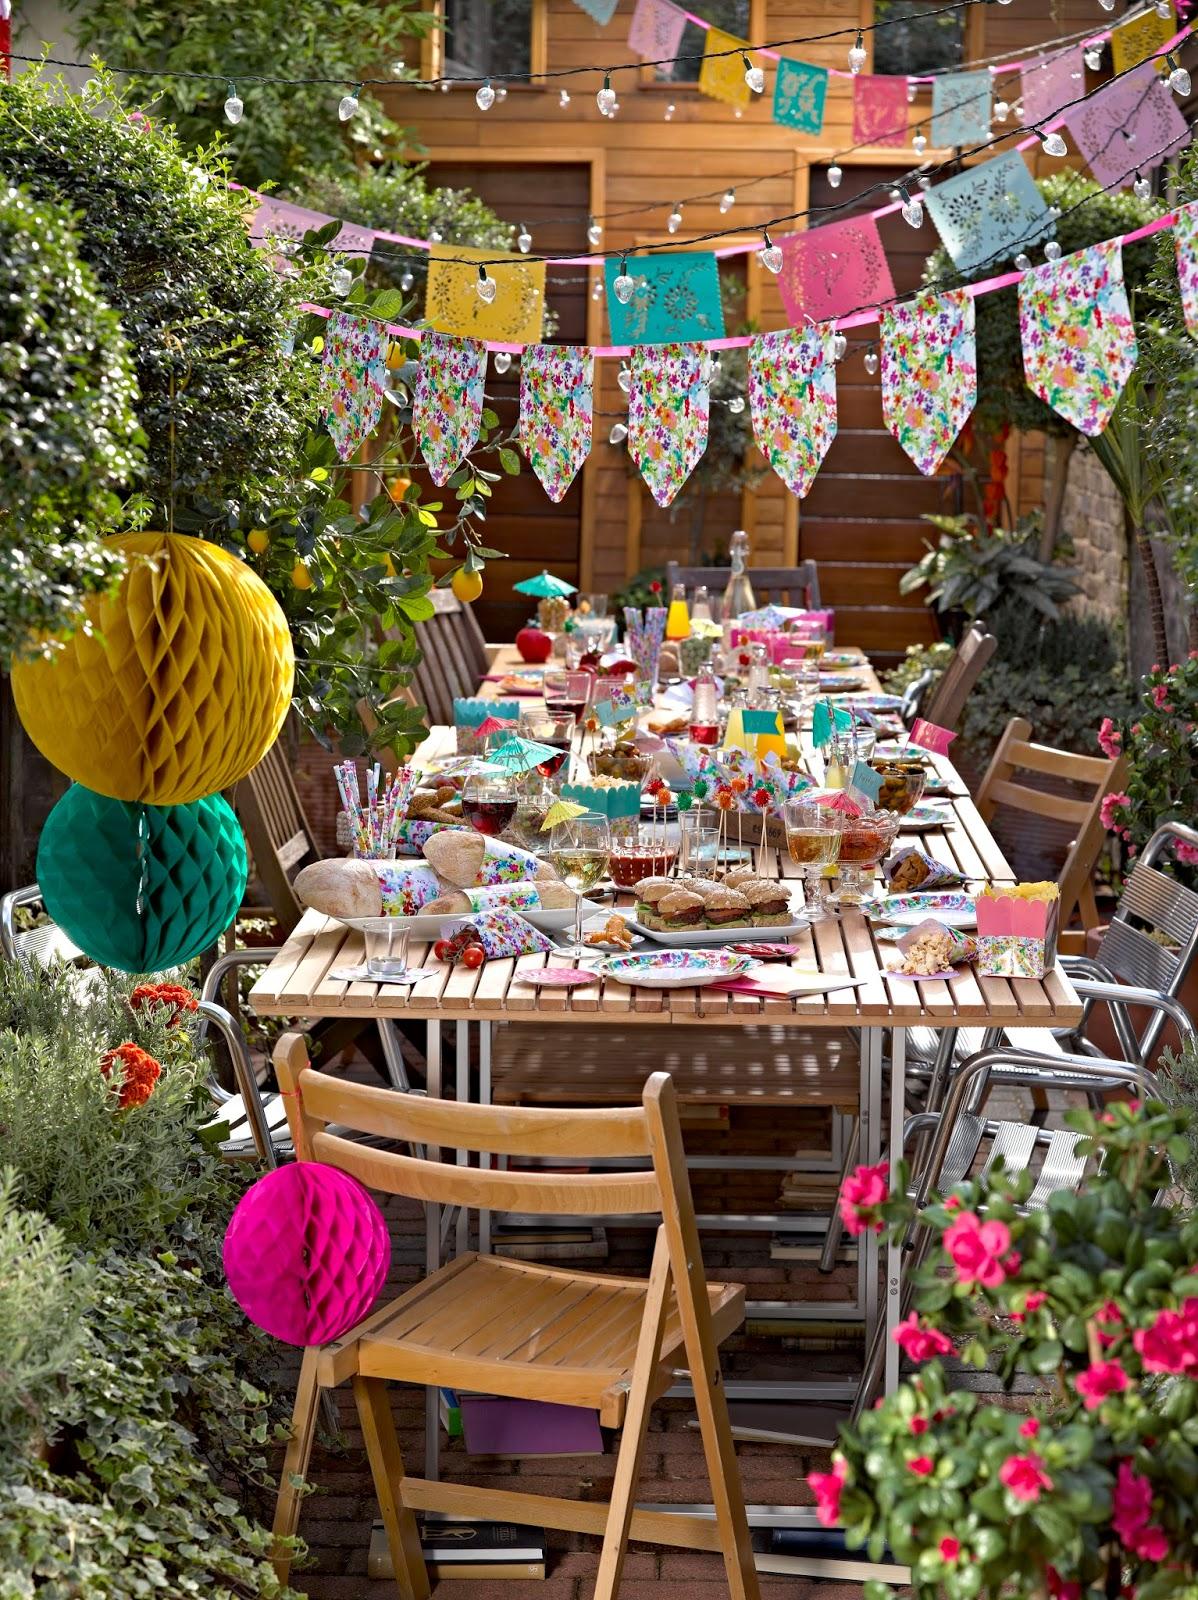 Birthday Decorations Garden Image Inspiration of Cake and Birthday